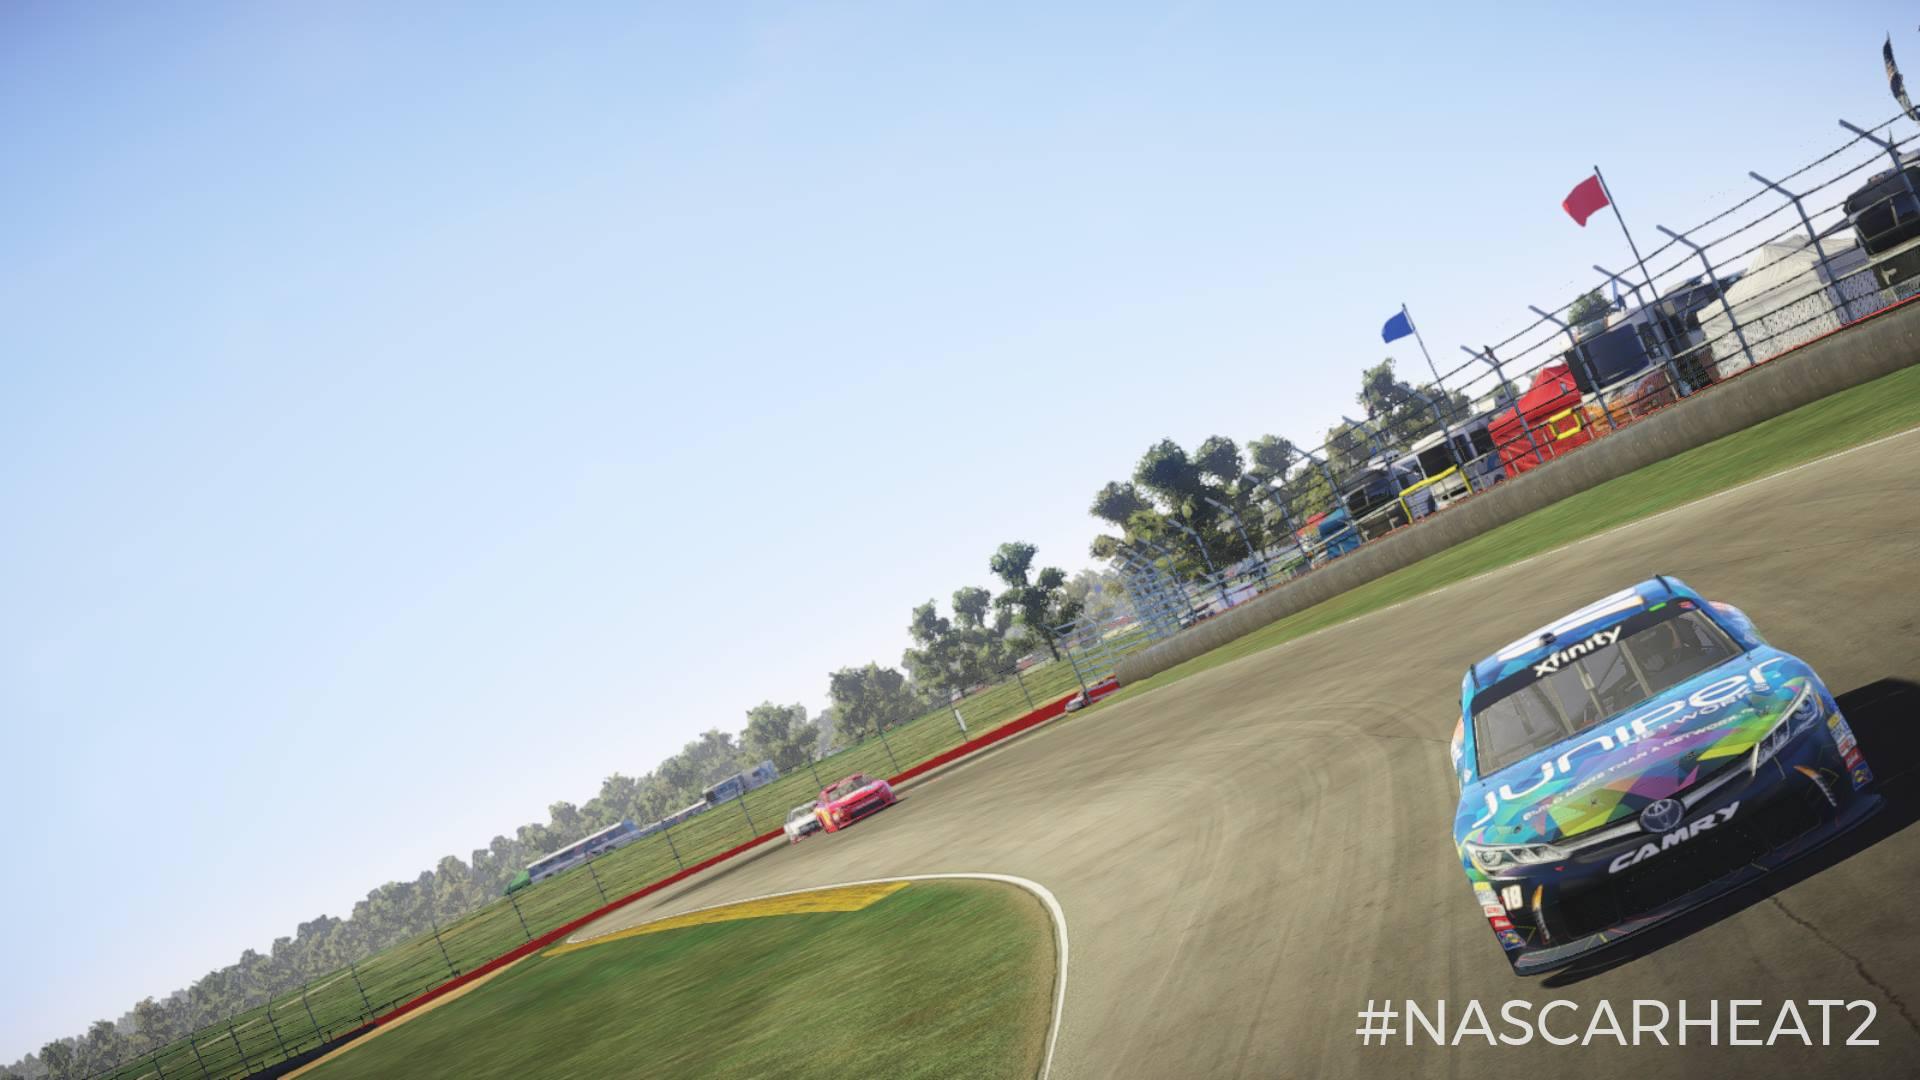 Mid Ohio Sportscar Course >> NASCAR Heat 2 E3 2017 Impressions - Inside Sim Racing